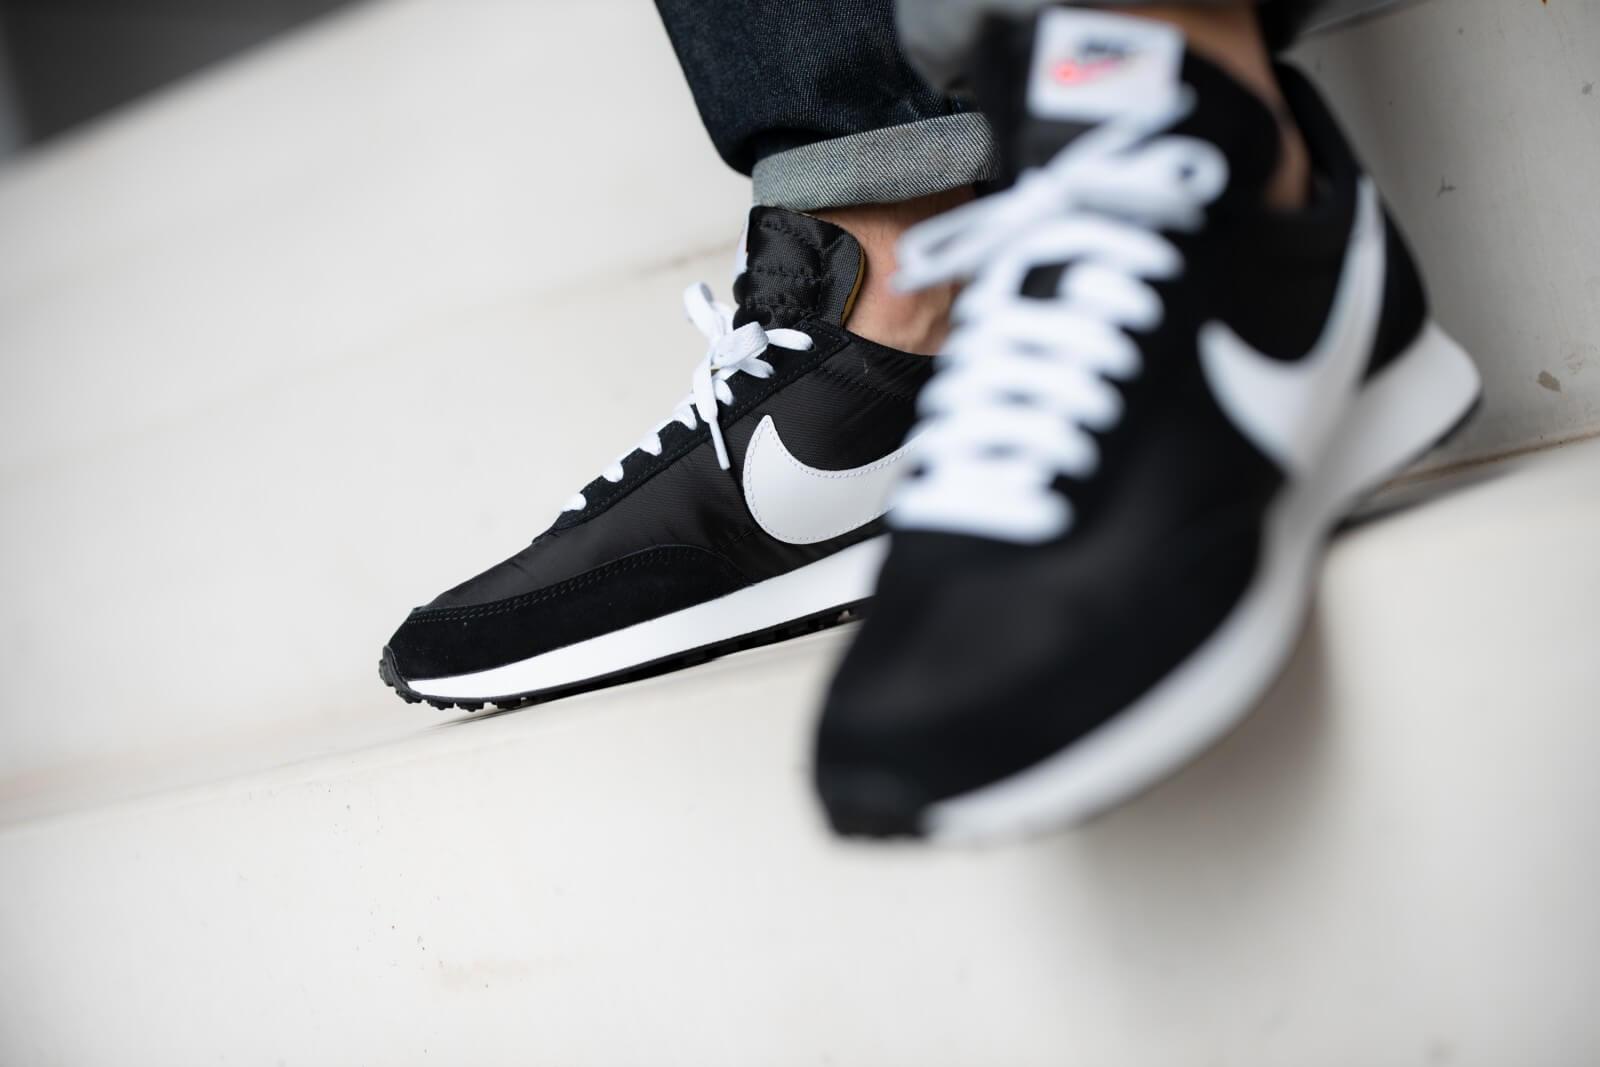 Nike Air Tailwind 79 Black/White - 487754-012